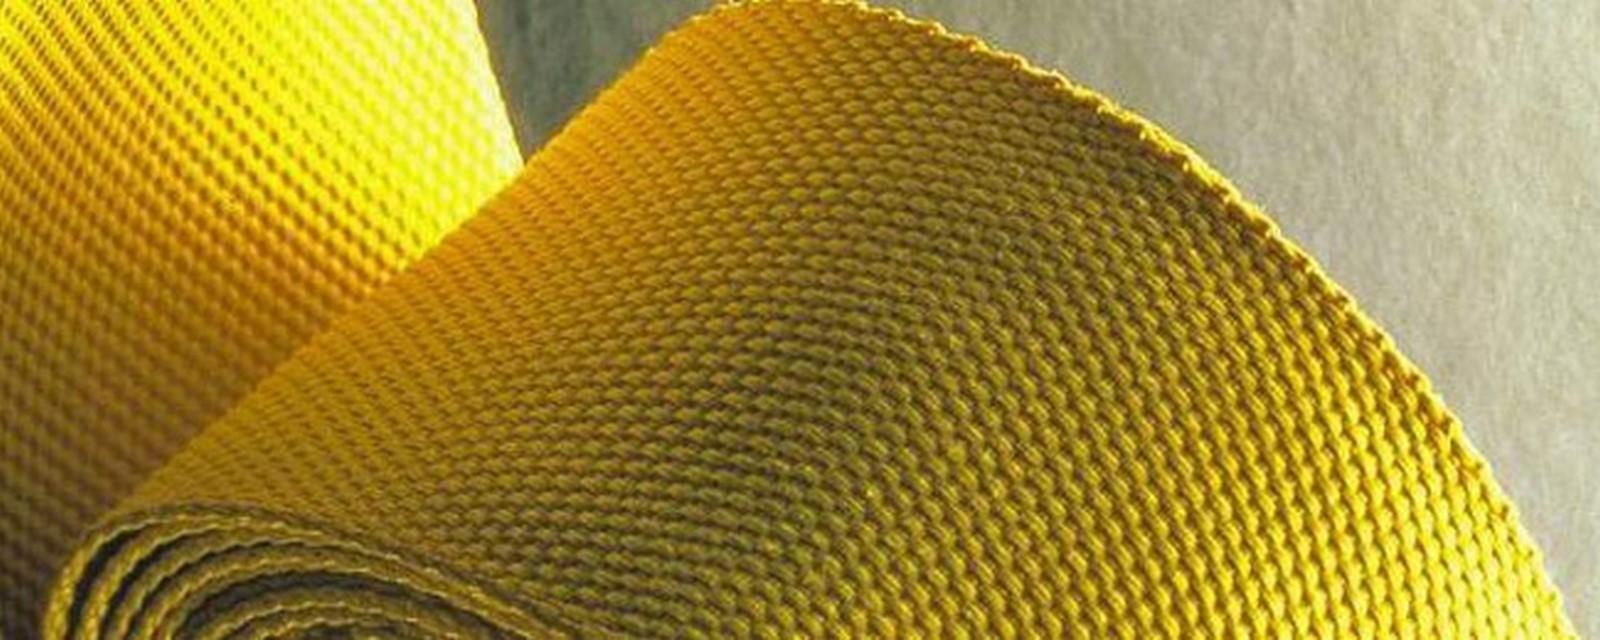 Alternative Materials: Fibre-reinforced plastic - Sheet3